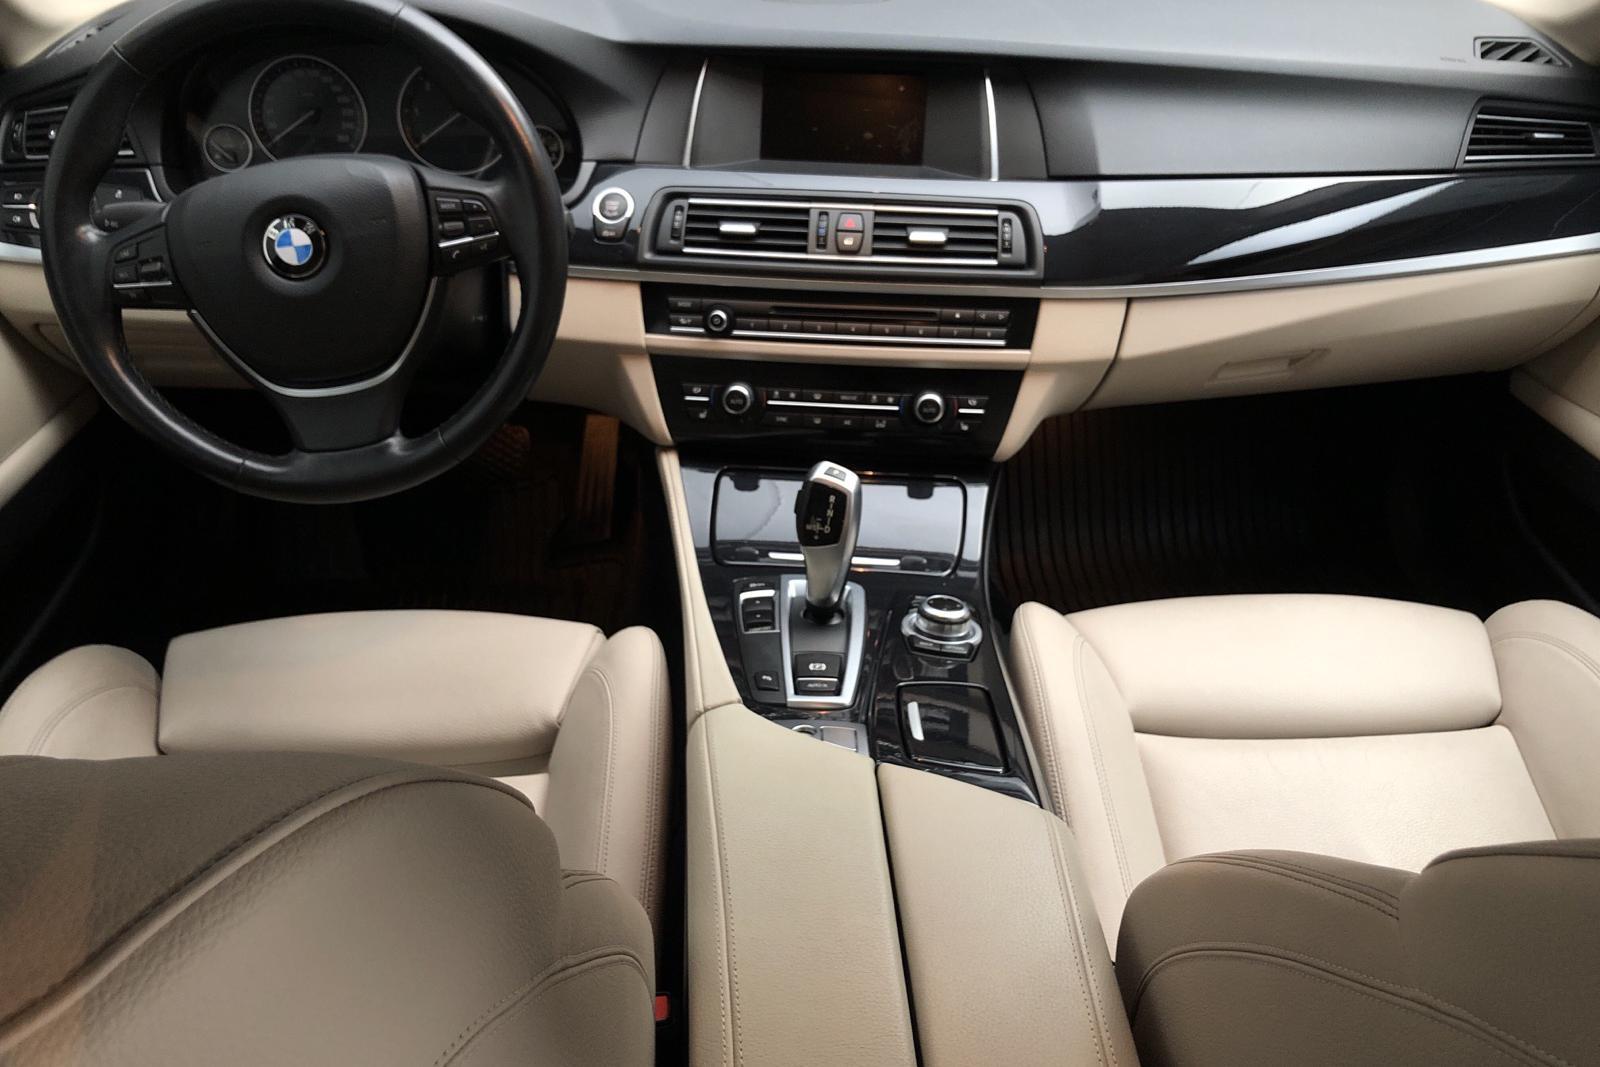 BMW 520d Touring, F11 (190hk) - 66 830 km - Automatic - black - 2017